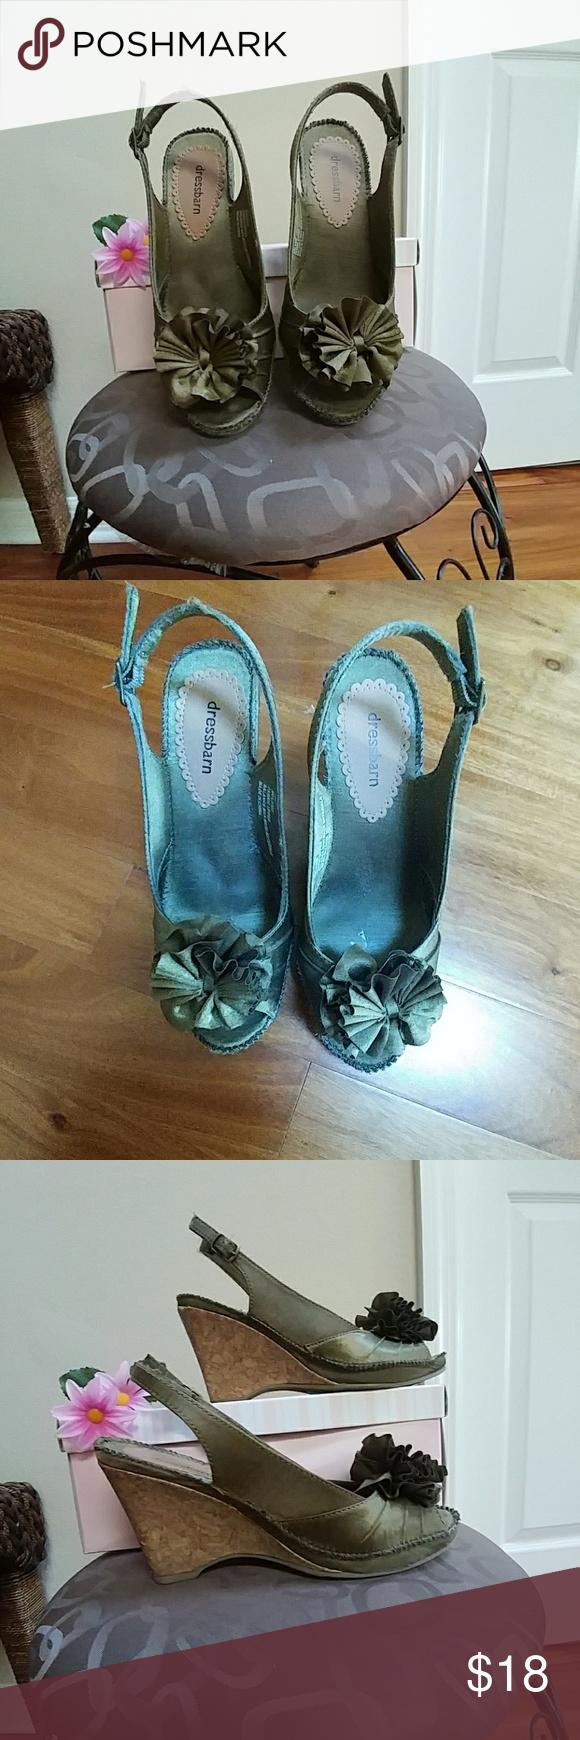 Heels for dark green dress  Dress Barn Shoes  My Posh Closet  Pinterest